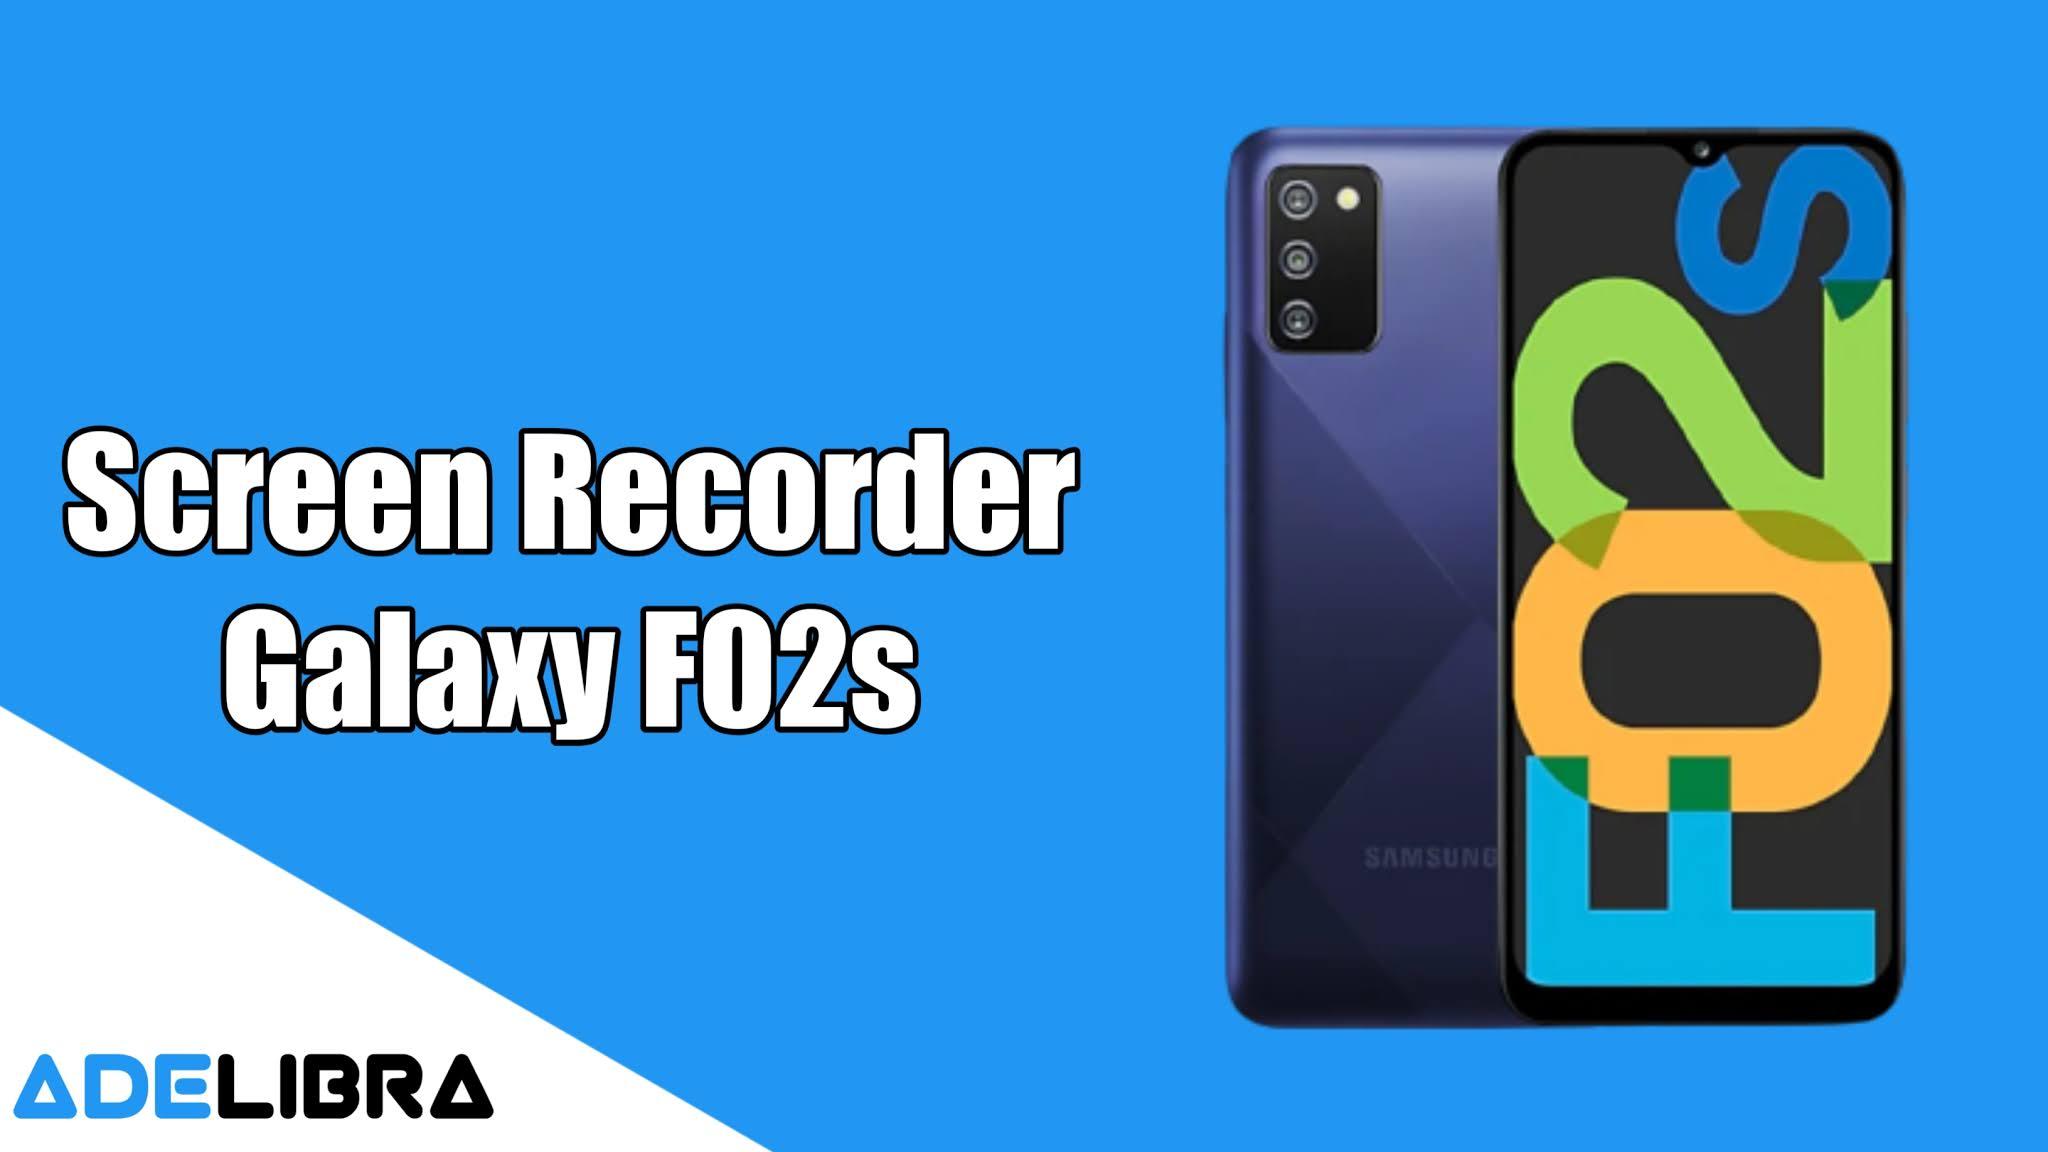 Screen Recorder Samsung Galaxy F02s